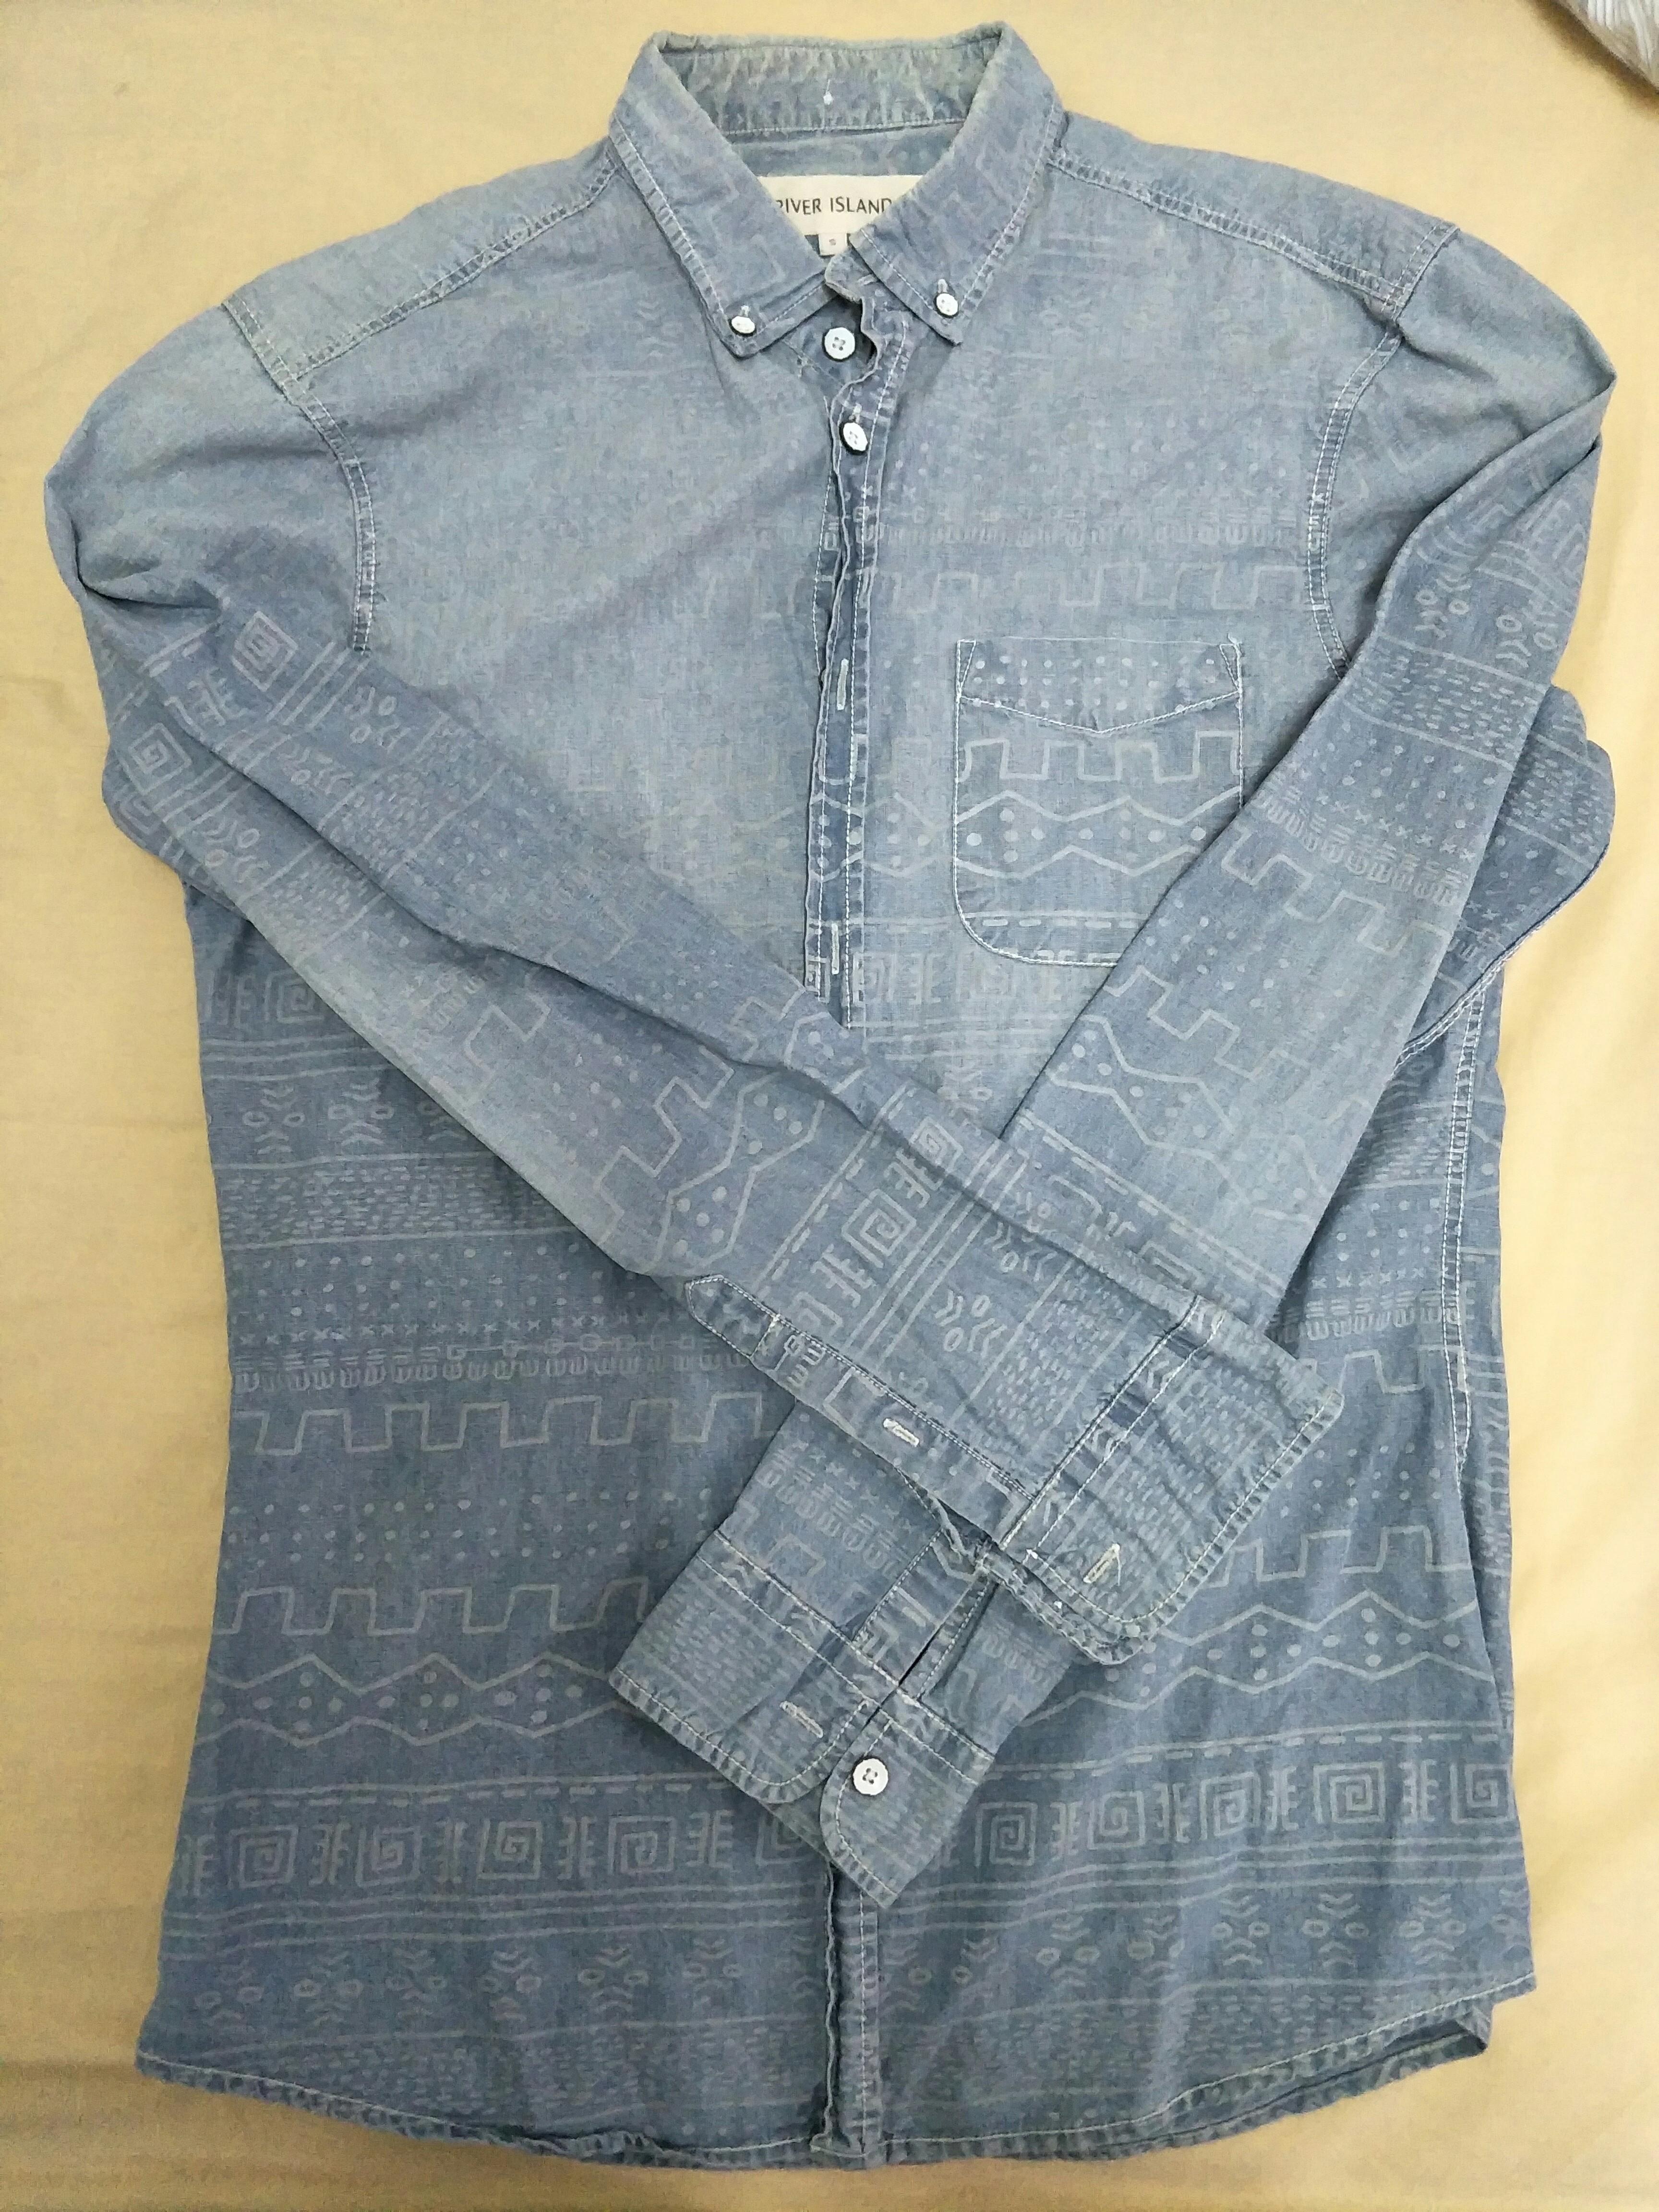 River island jeans shirt